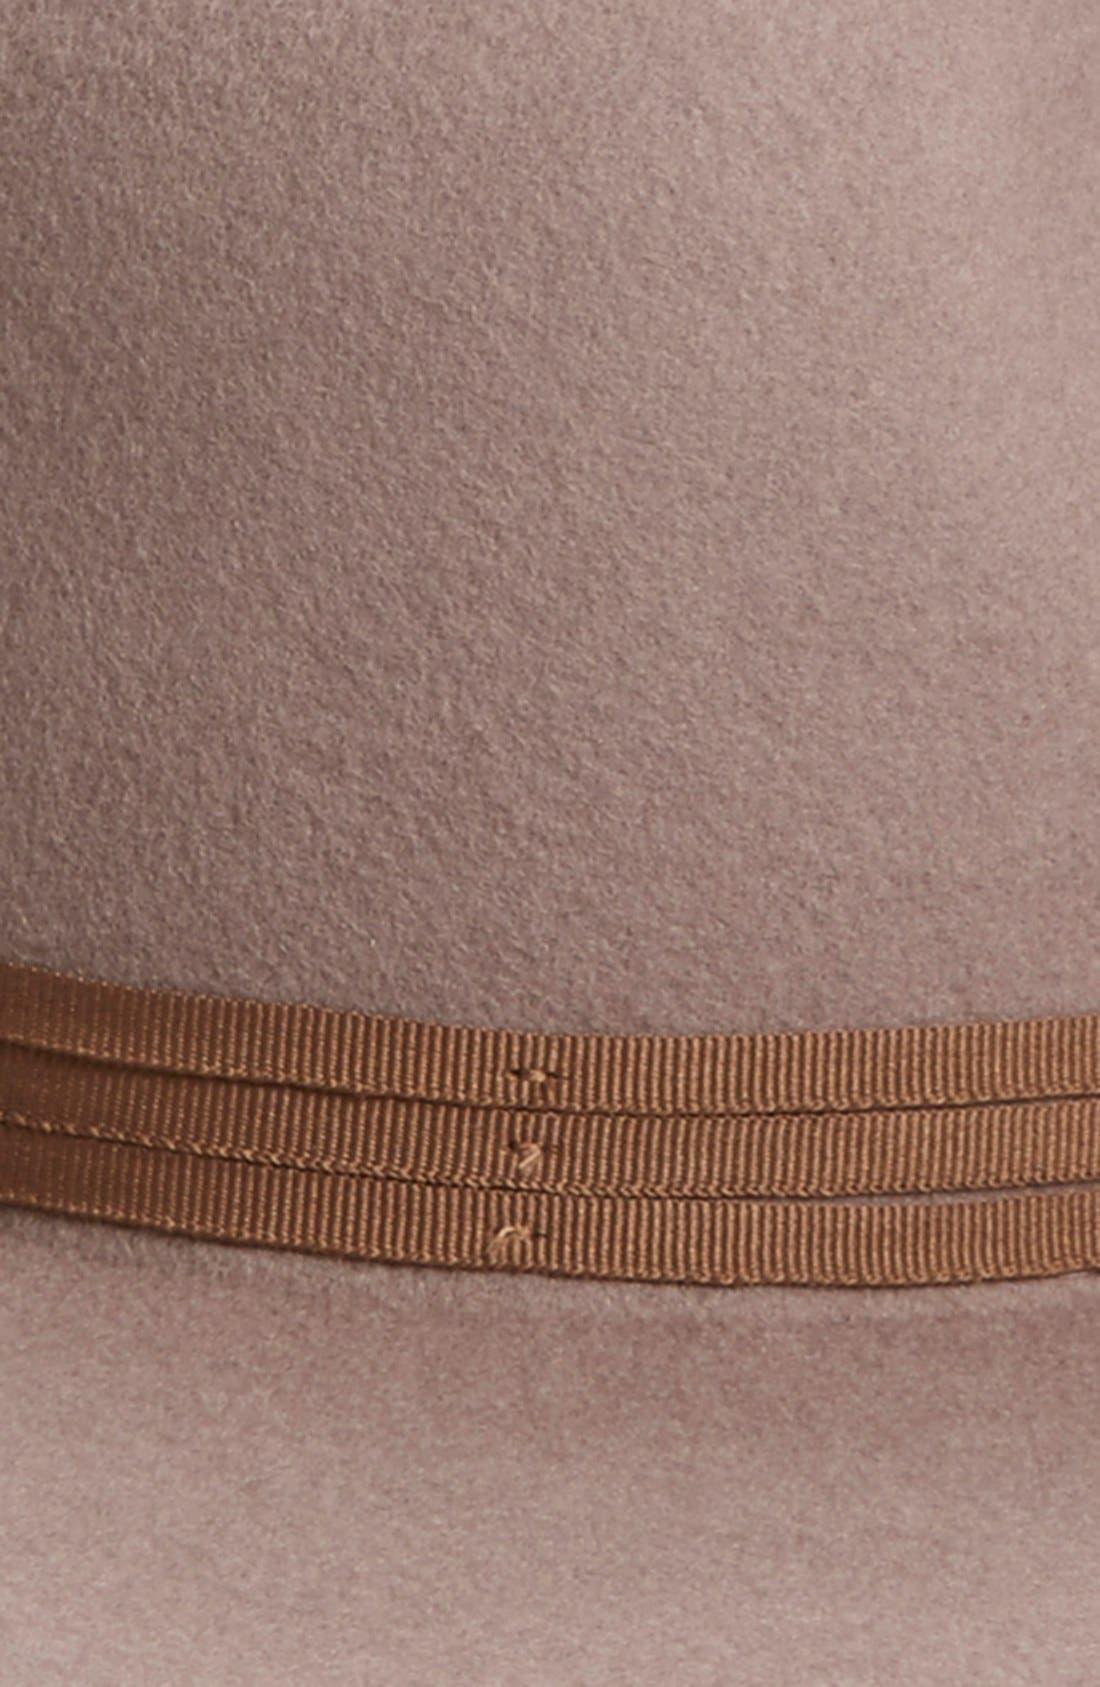 'Magdalena' Wide Brim Wool Felt Hat,                             Alternate thumbnail 2, color,                             250